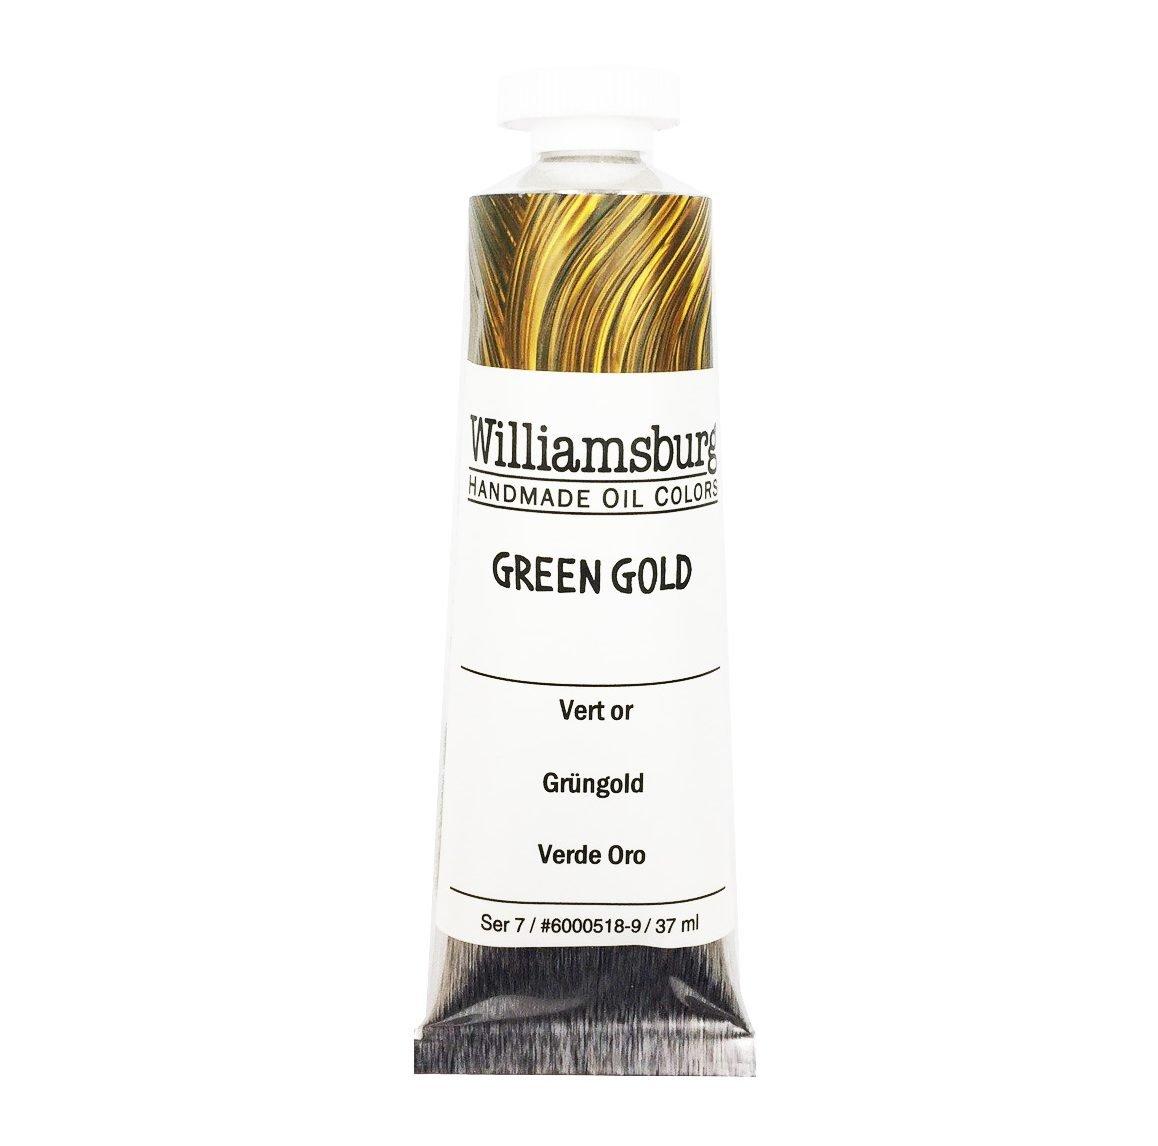 williamsburg green gold london art shop buy art supplies